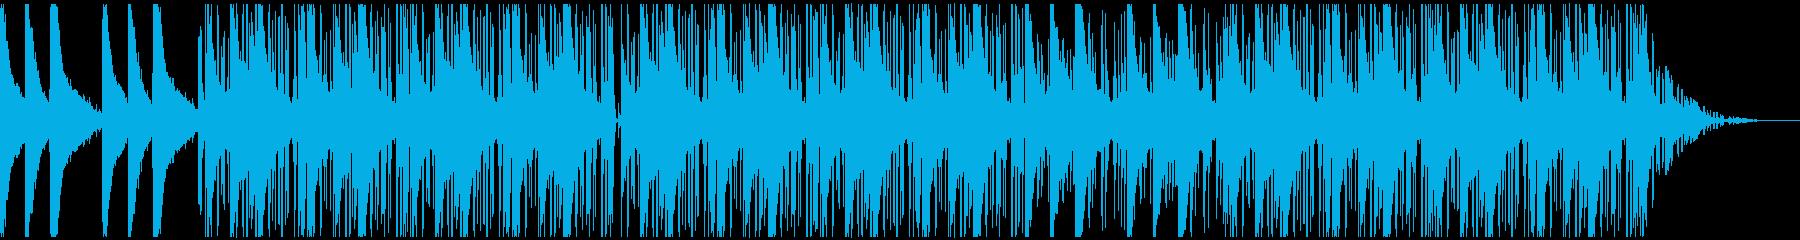 lofiヒップホップ:スクラッチFX無しの再生済みの波形